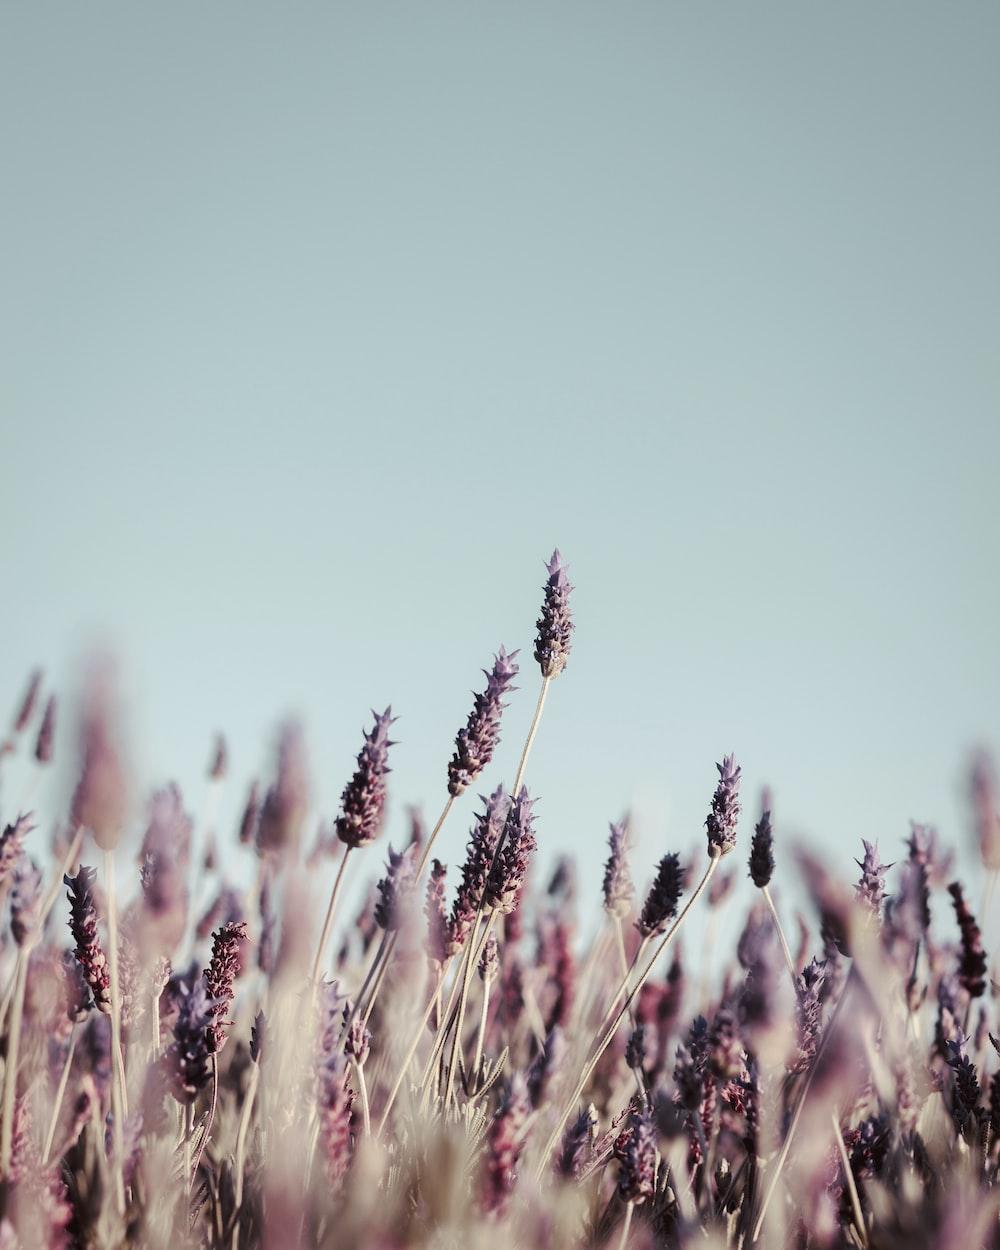 purple petaled flower field at daytime